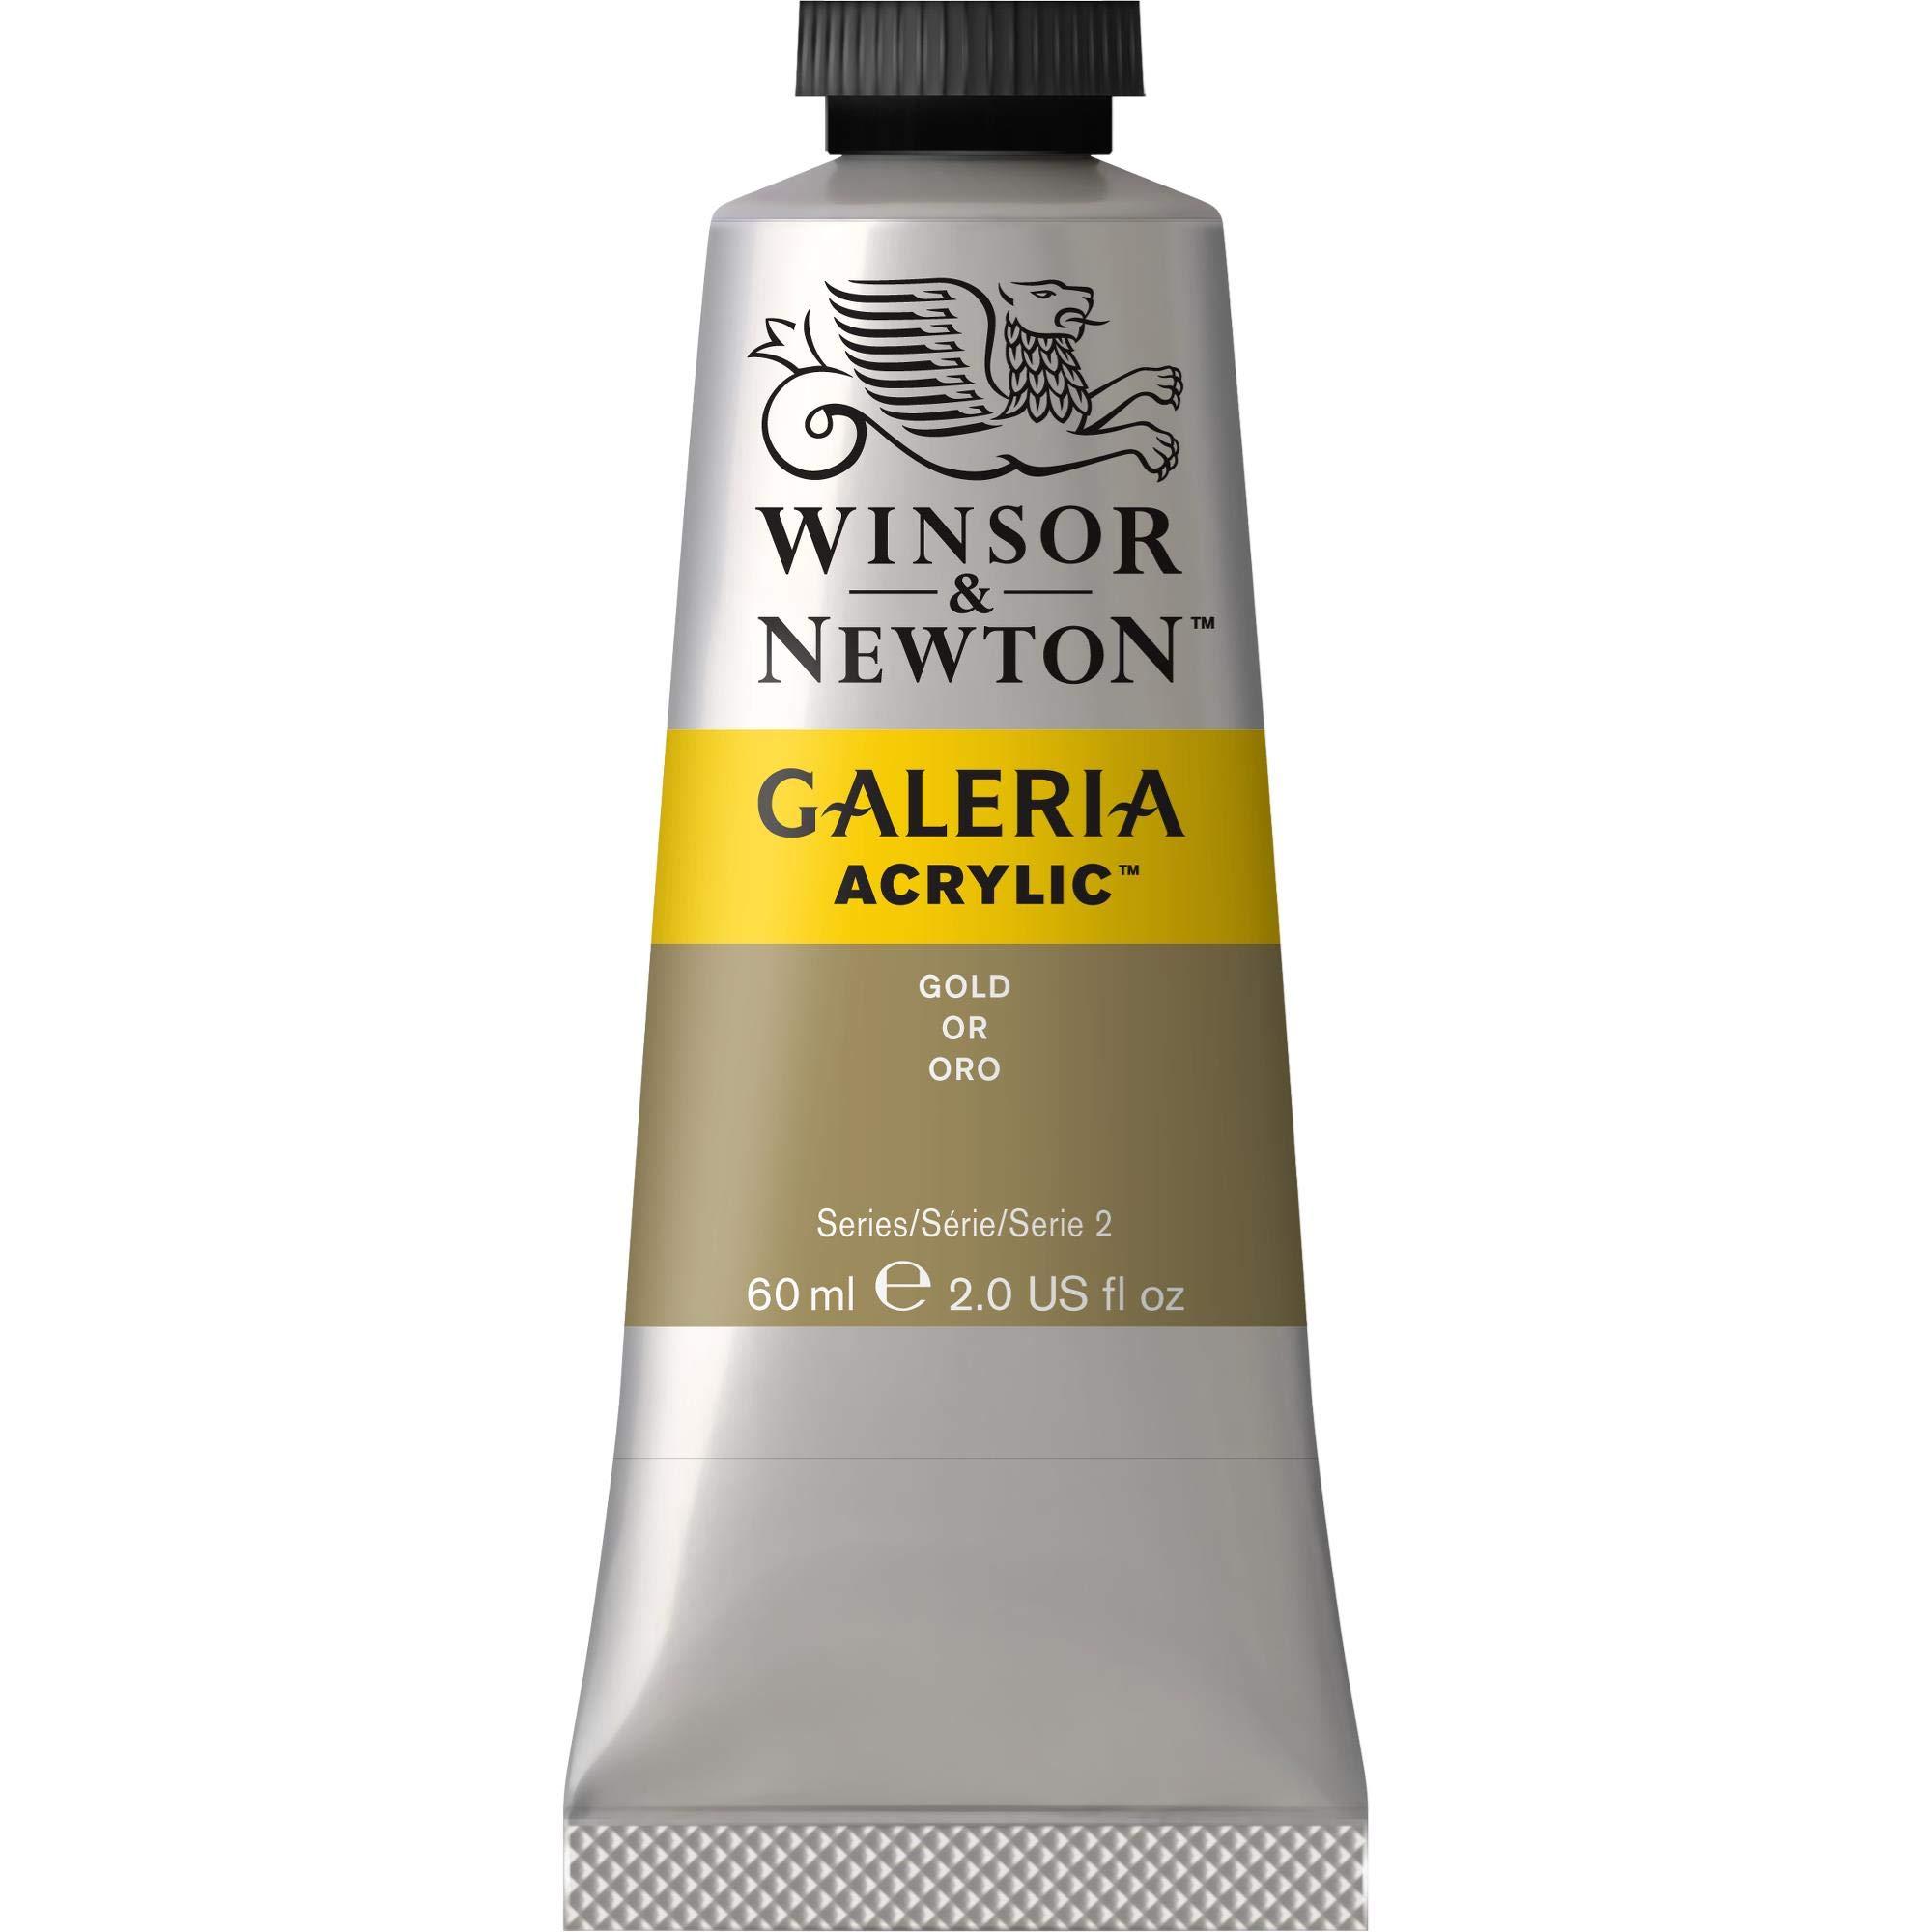 Winsor & Newton Galeria Acrylic Paint, 60-ml Tube, Gold